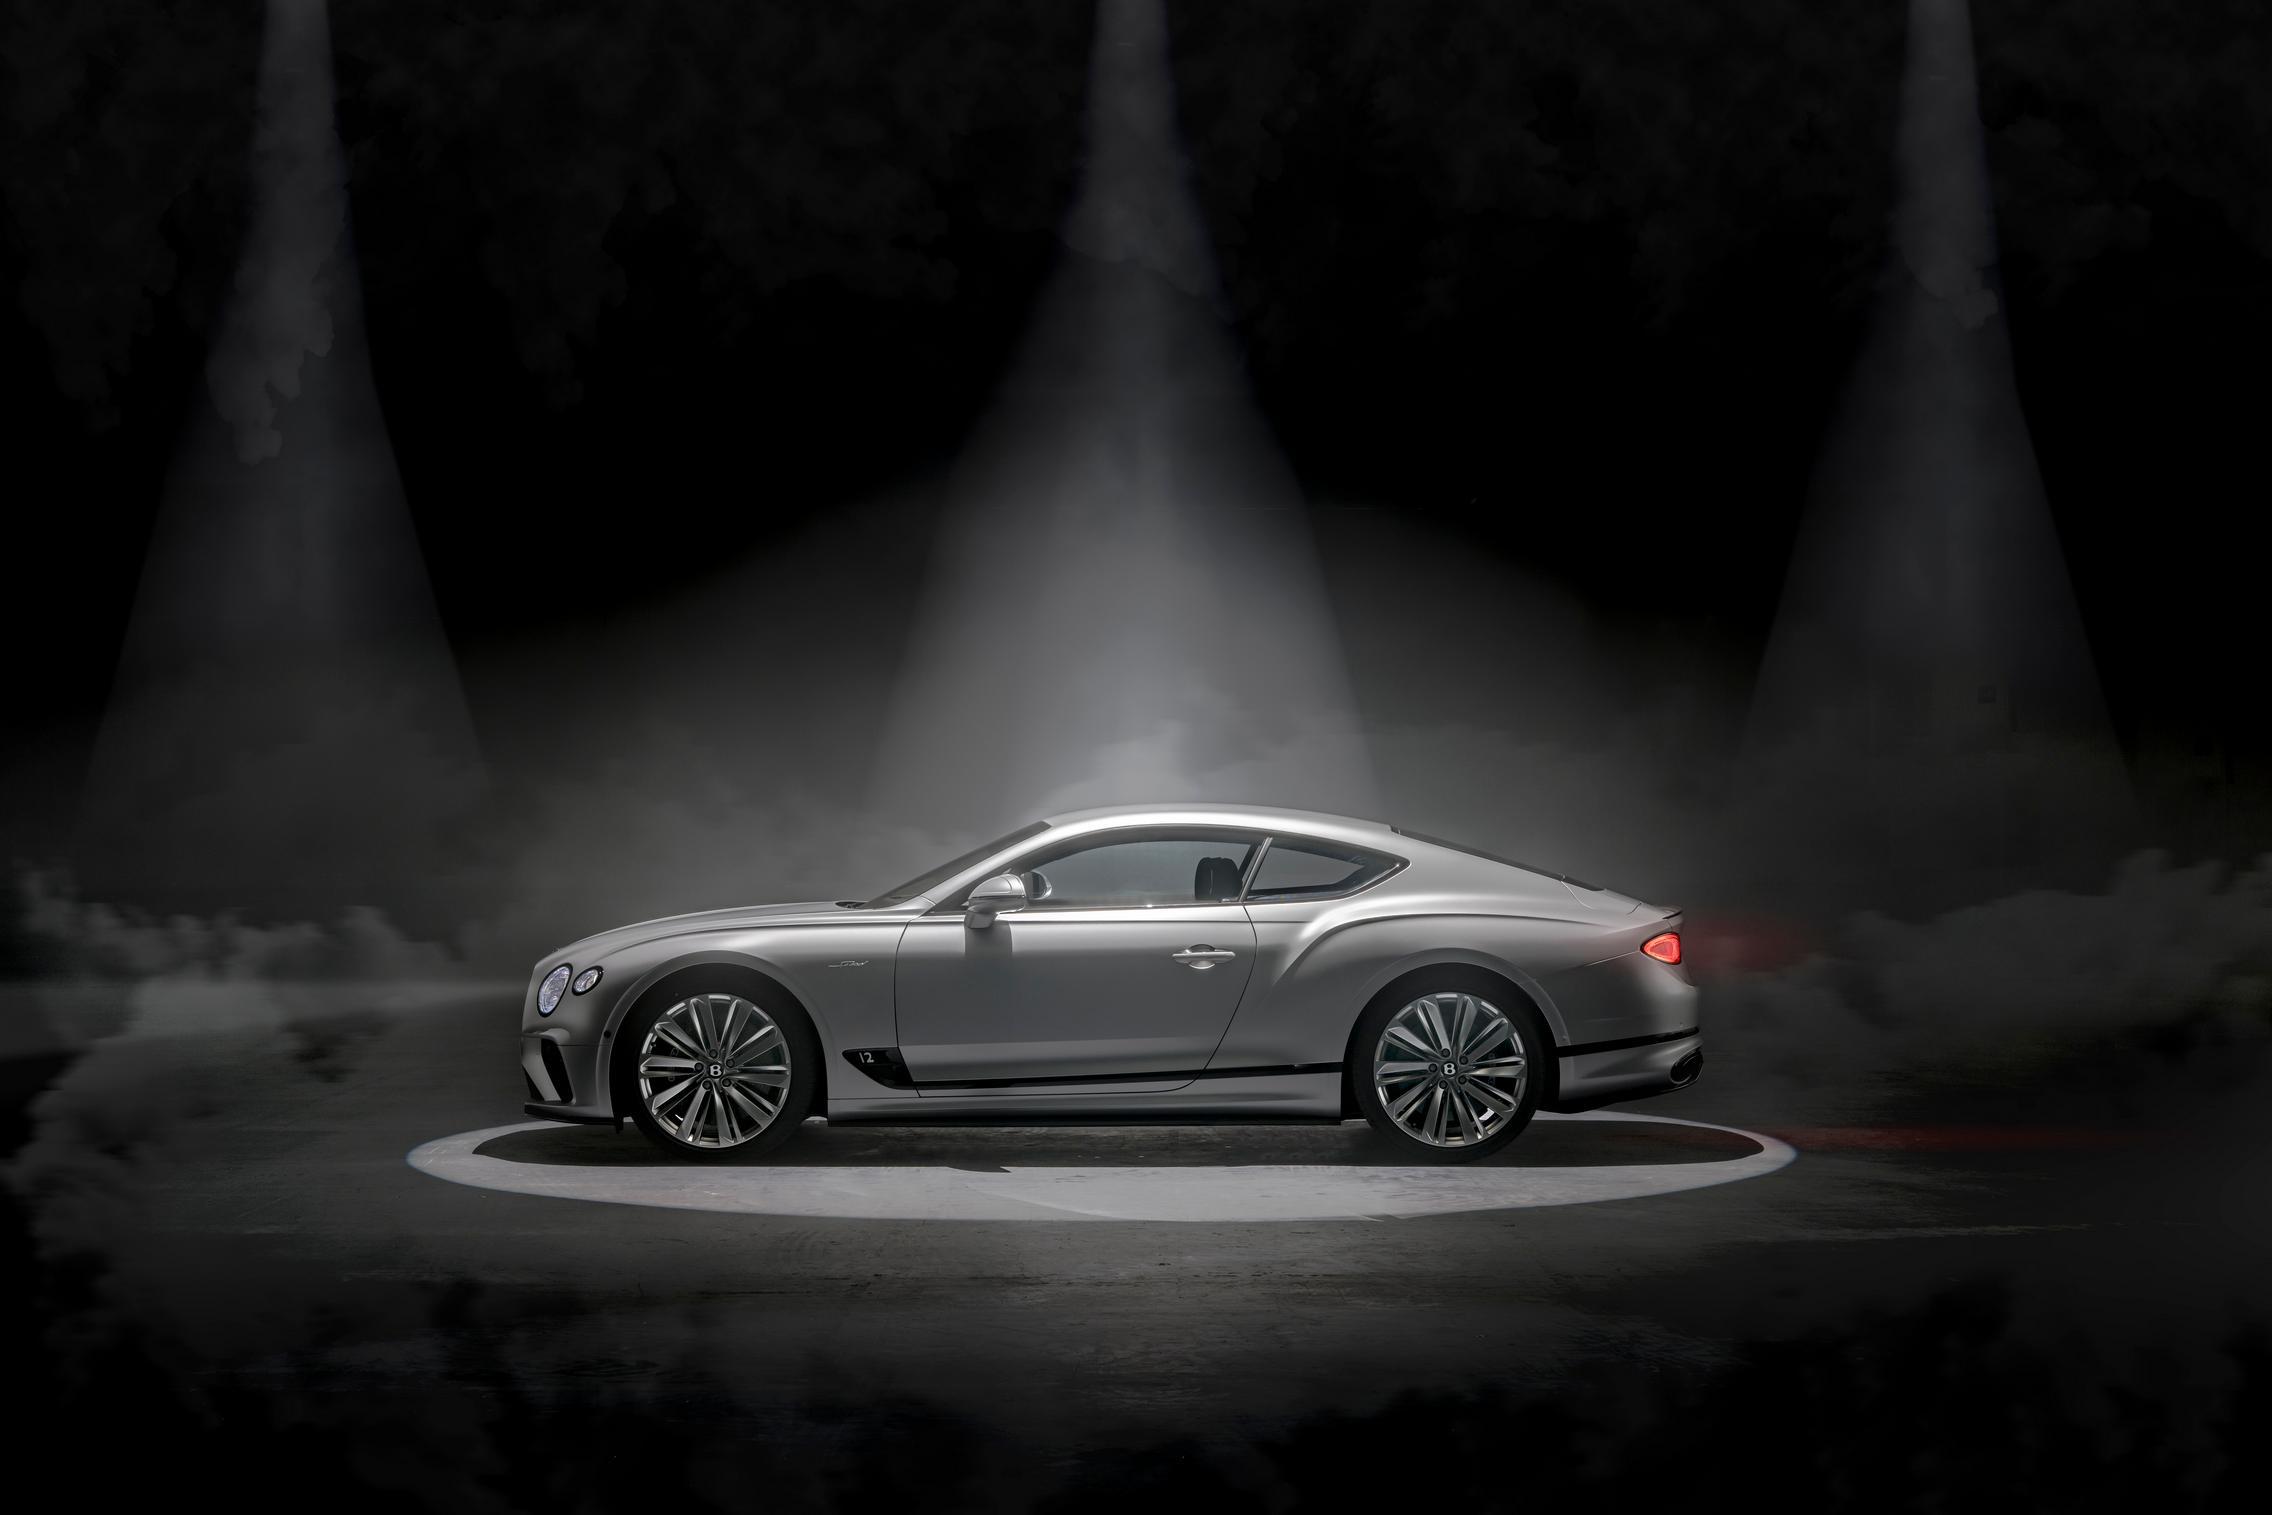 Bentley Continental GT Speed side